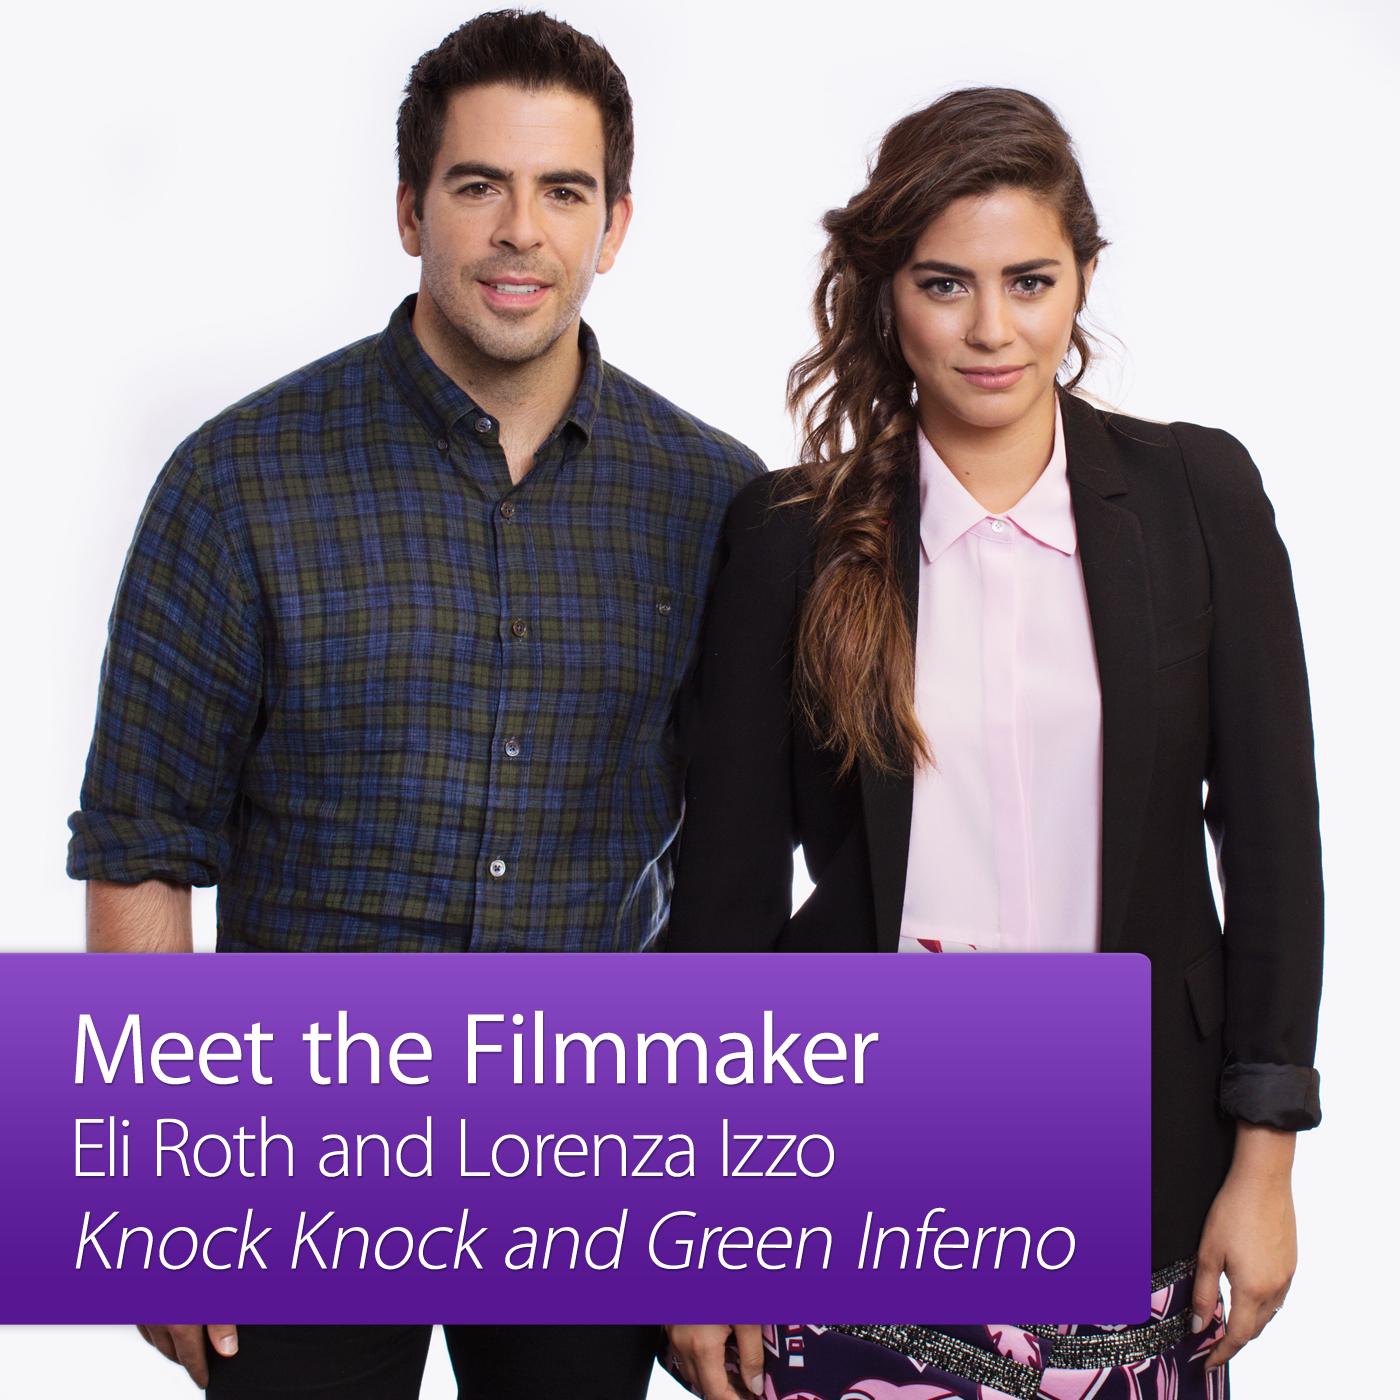 Eli Roth and Lorenza Izzo: Meet the Filmmaker